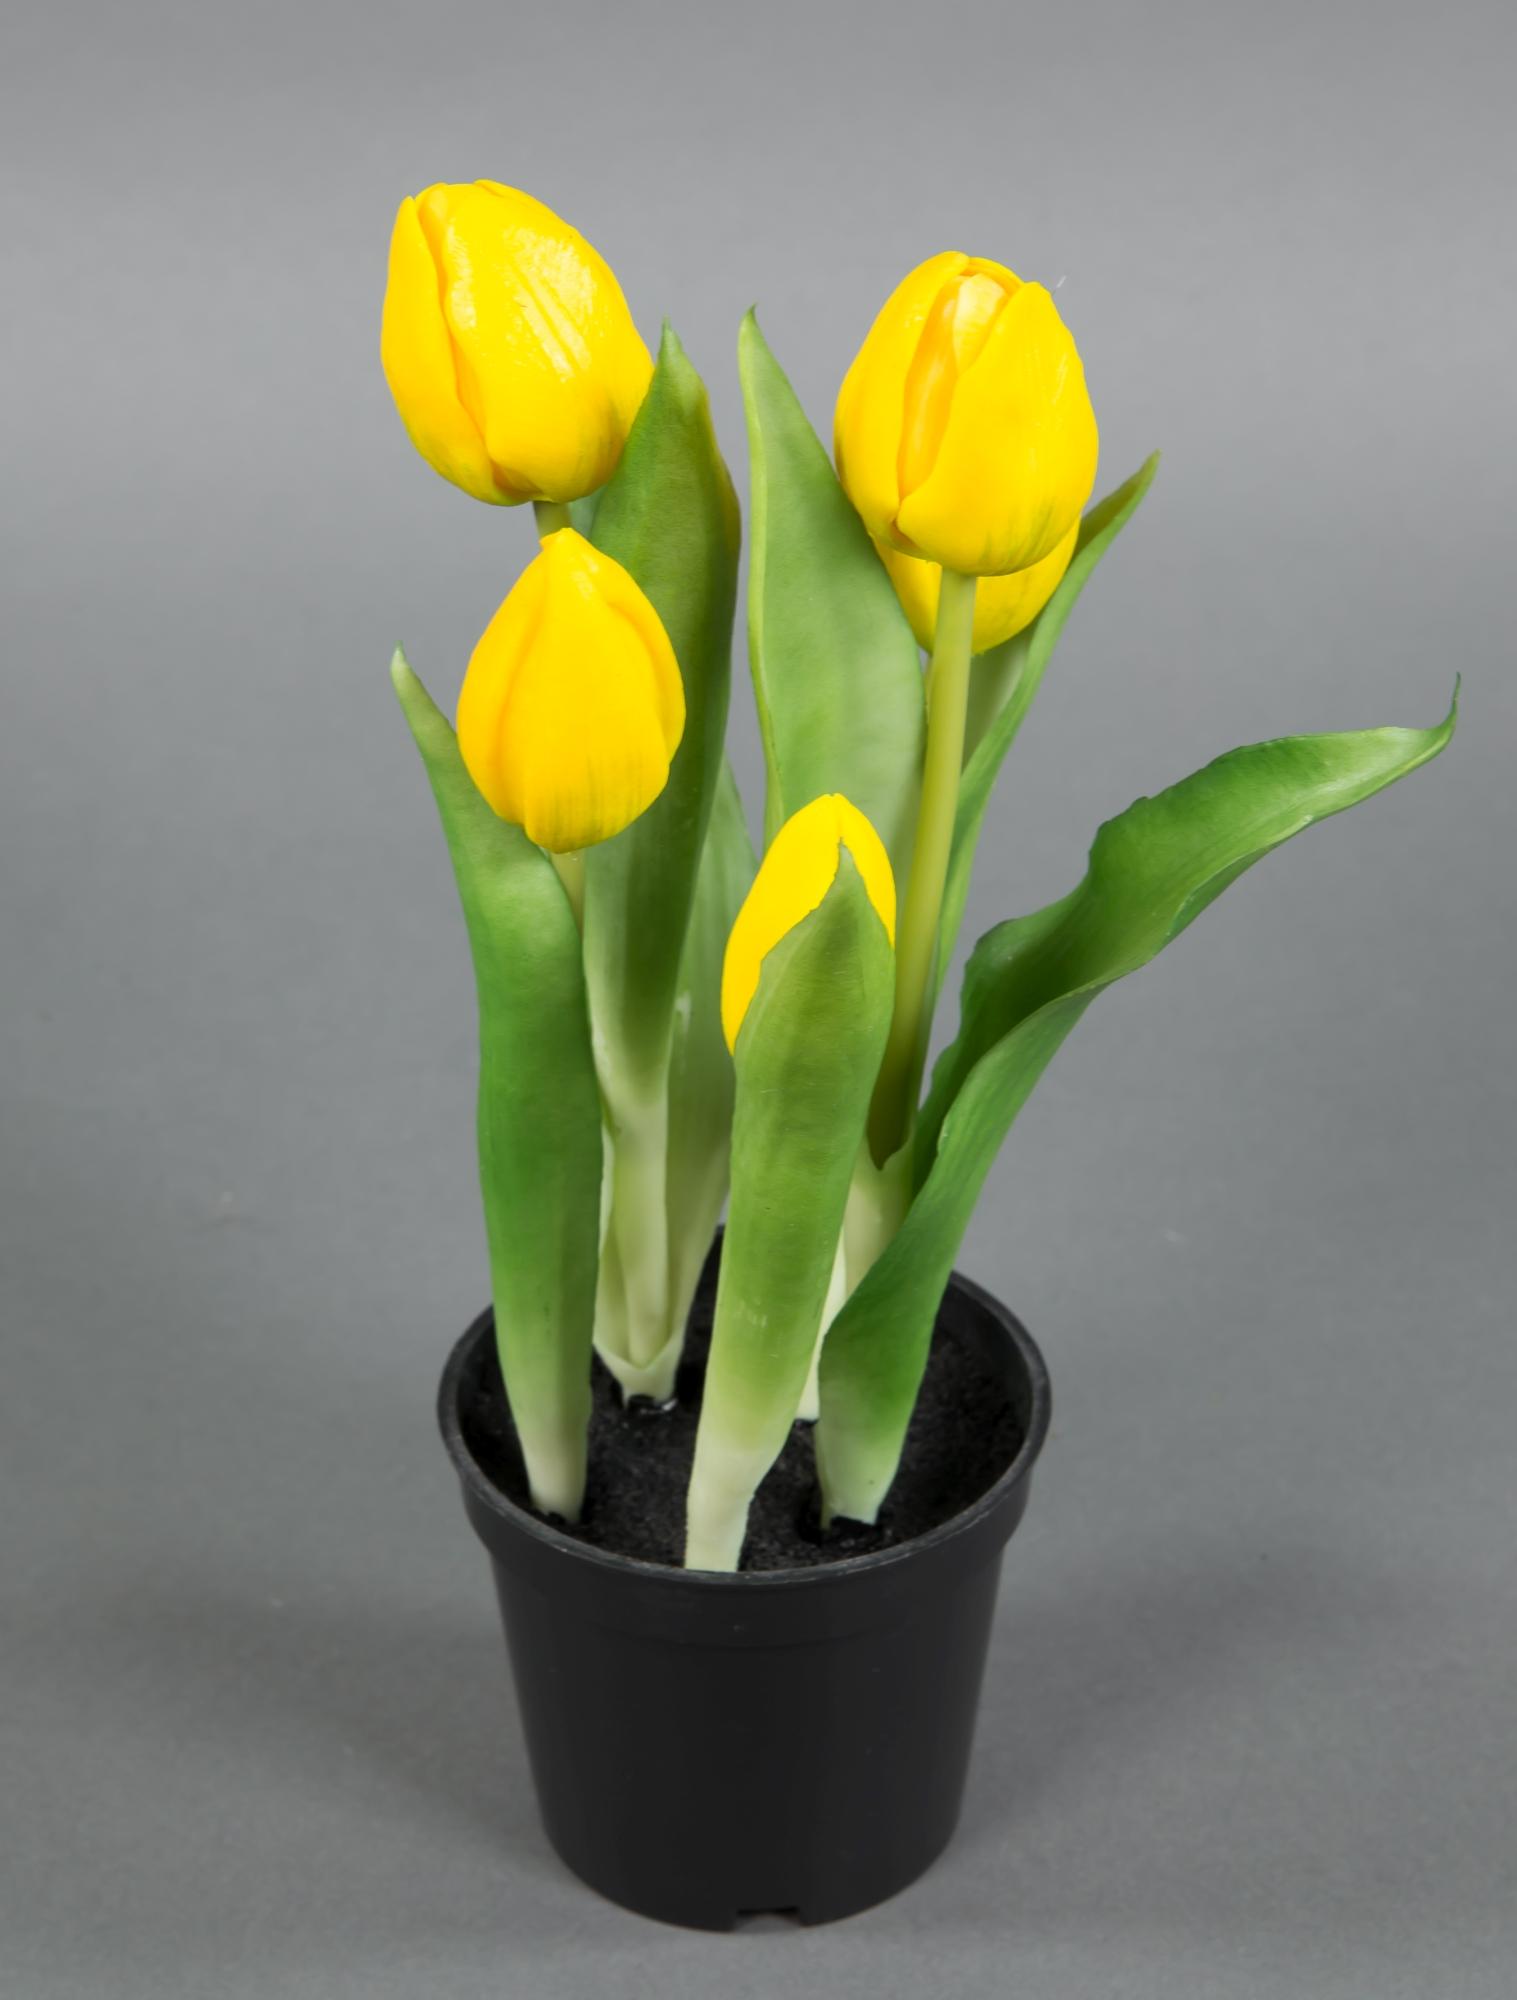 tulpen real touch 25cm gelb im topf ga kunstpflanzen k nstliche pflanzen tulpentopf fr hling. Black Bedroom Furniture Sets. Home Design Ideas